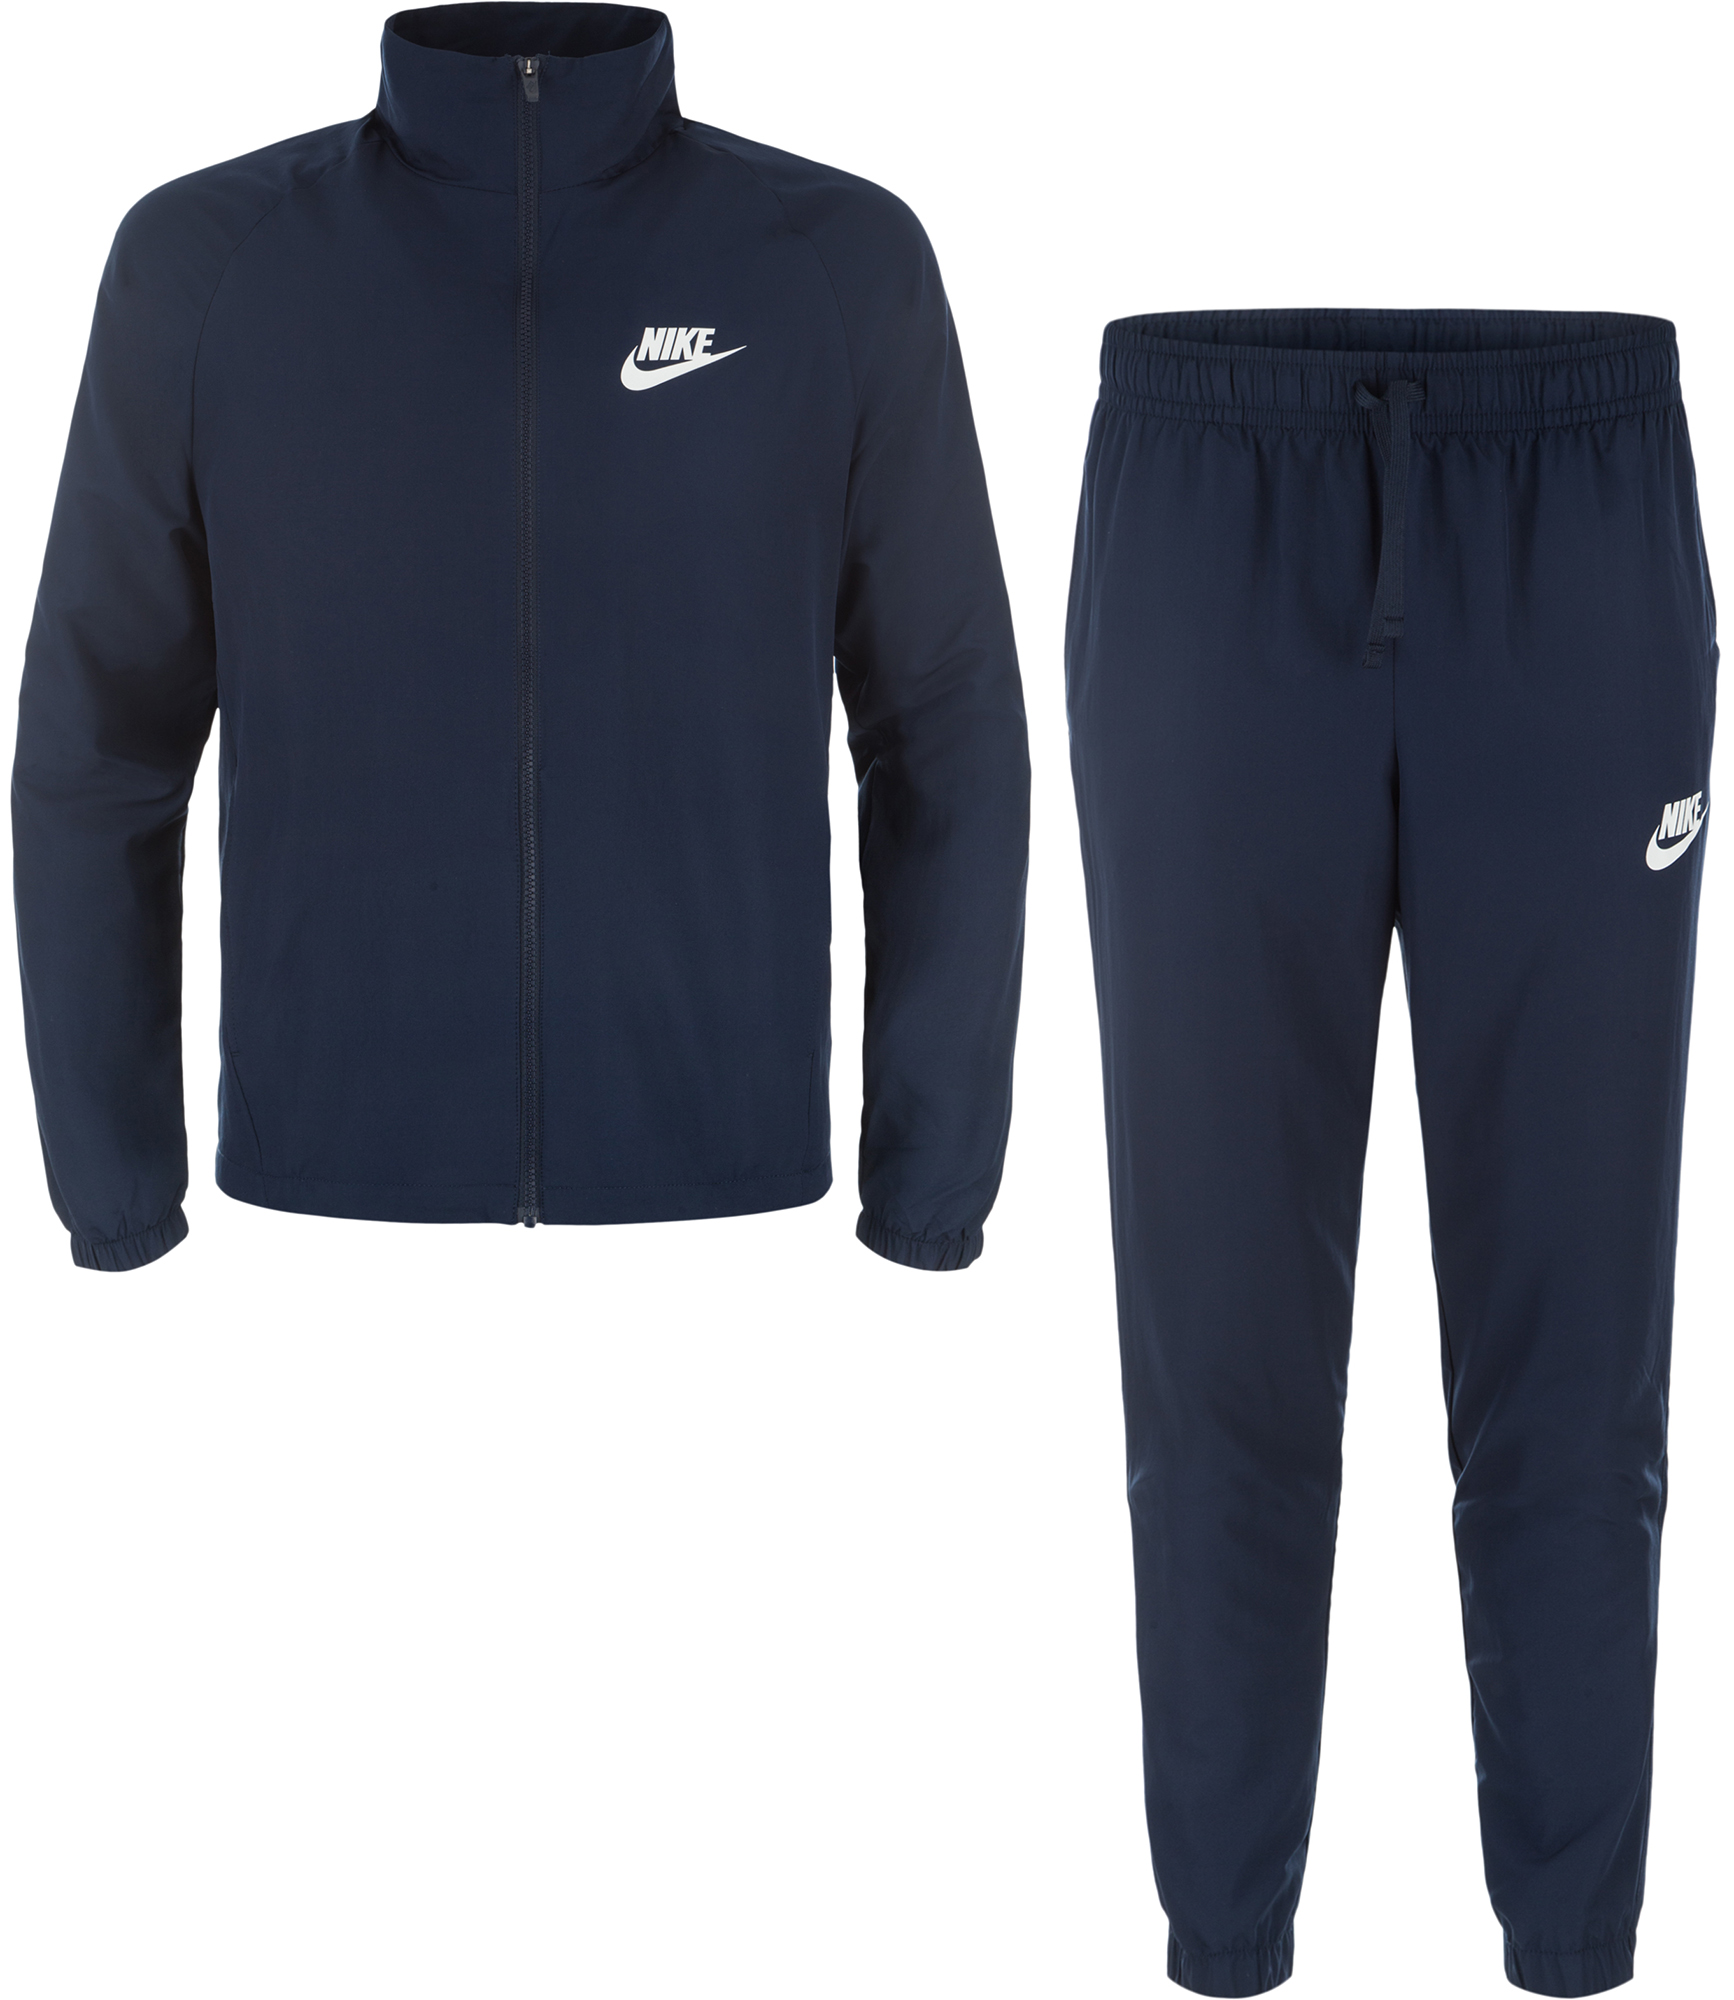 Nike Костюм спортивный мужской Nike Sportswear костюм спортивный болоневый мужской